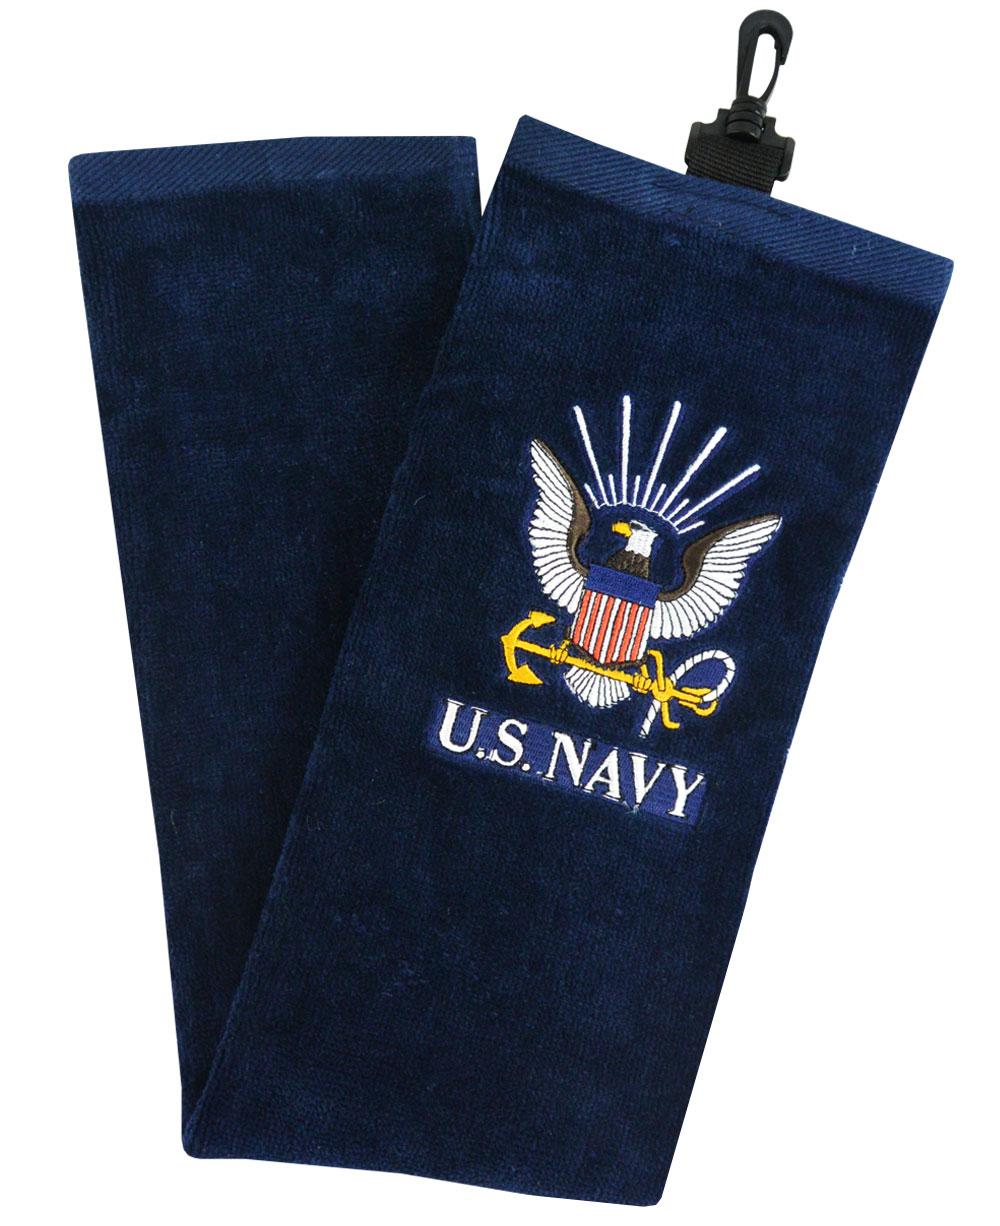 Hot Z Golf Us Military Tri Fold Towel Navy image